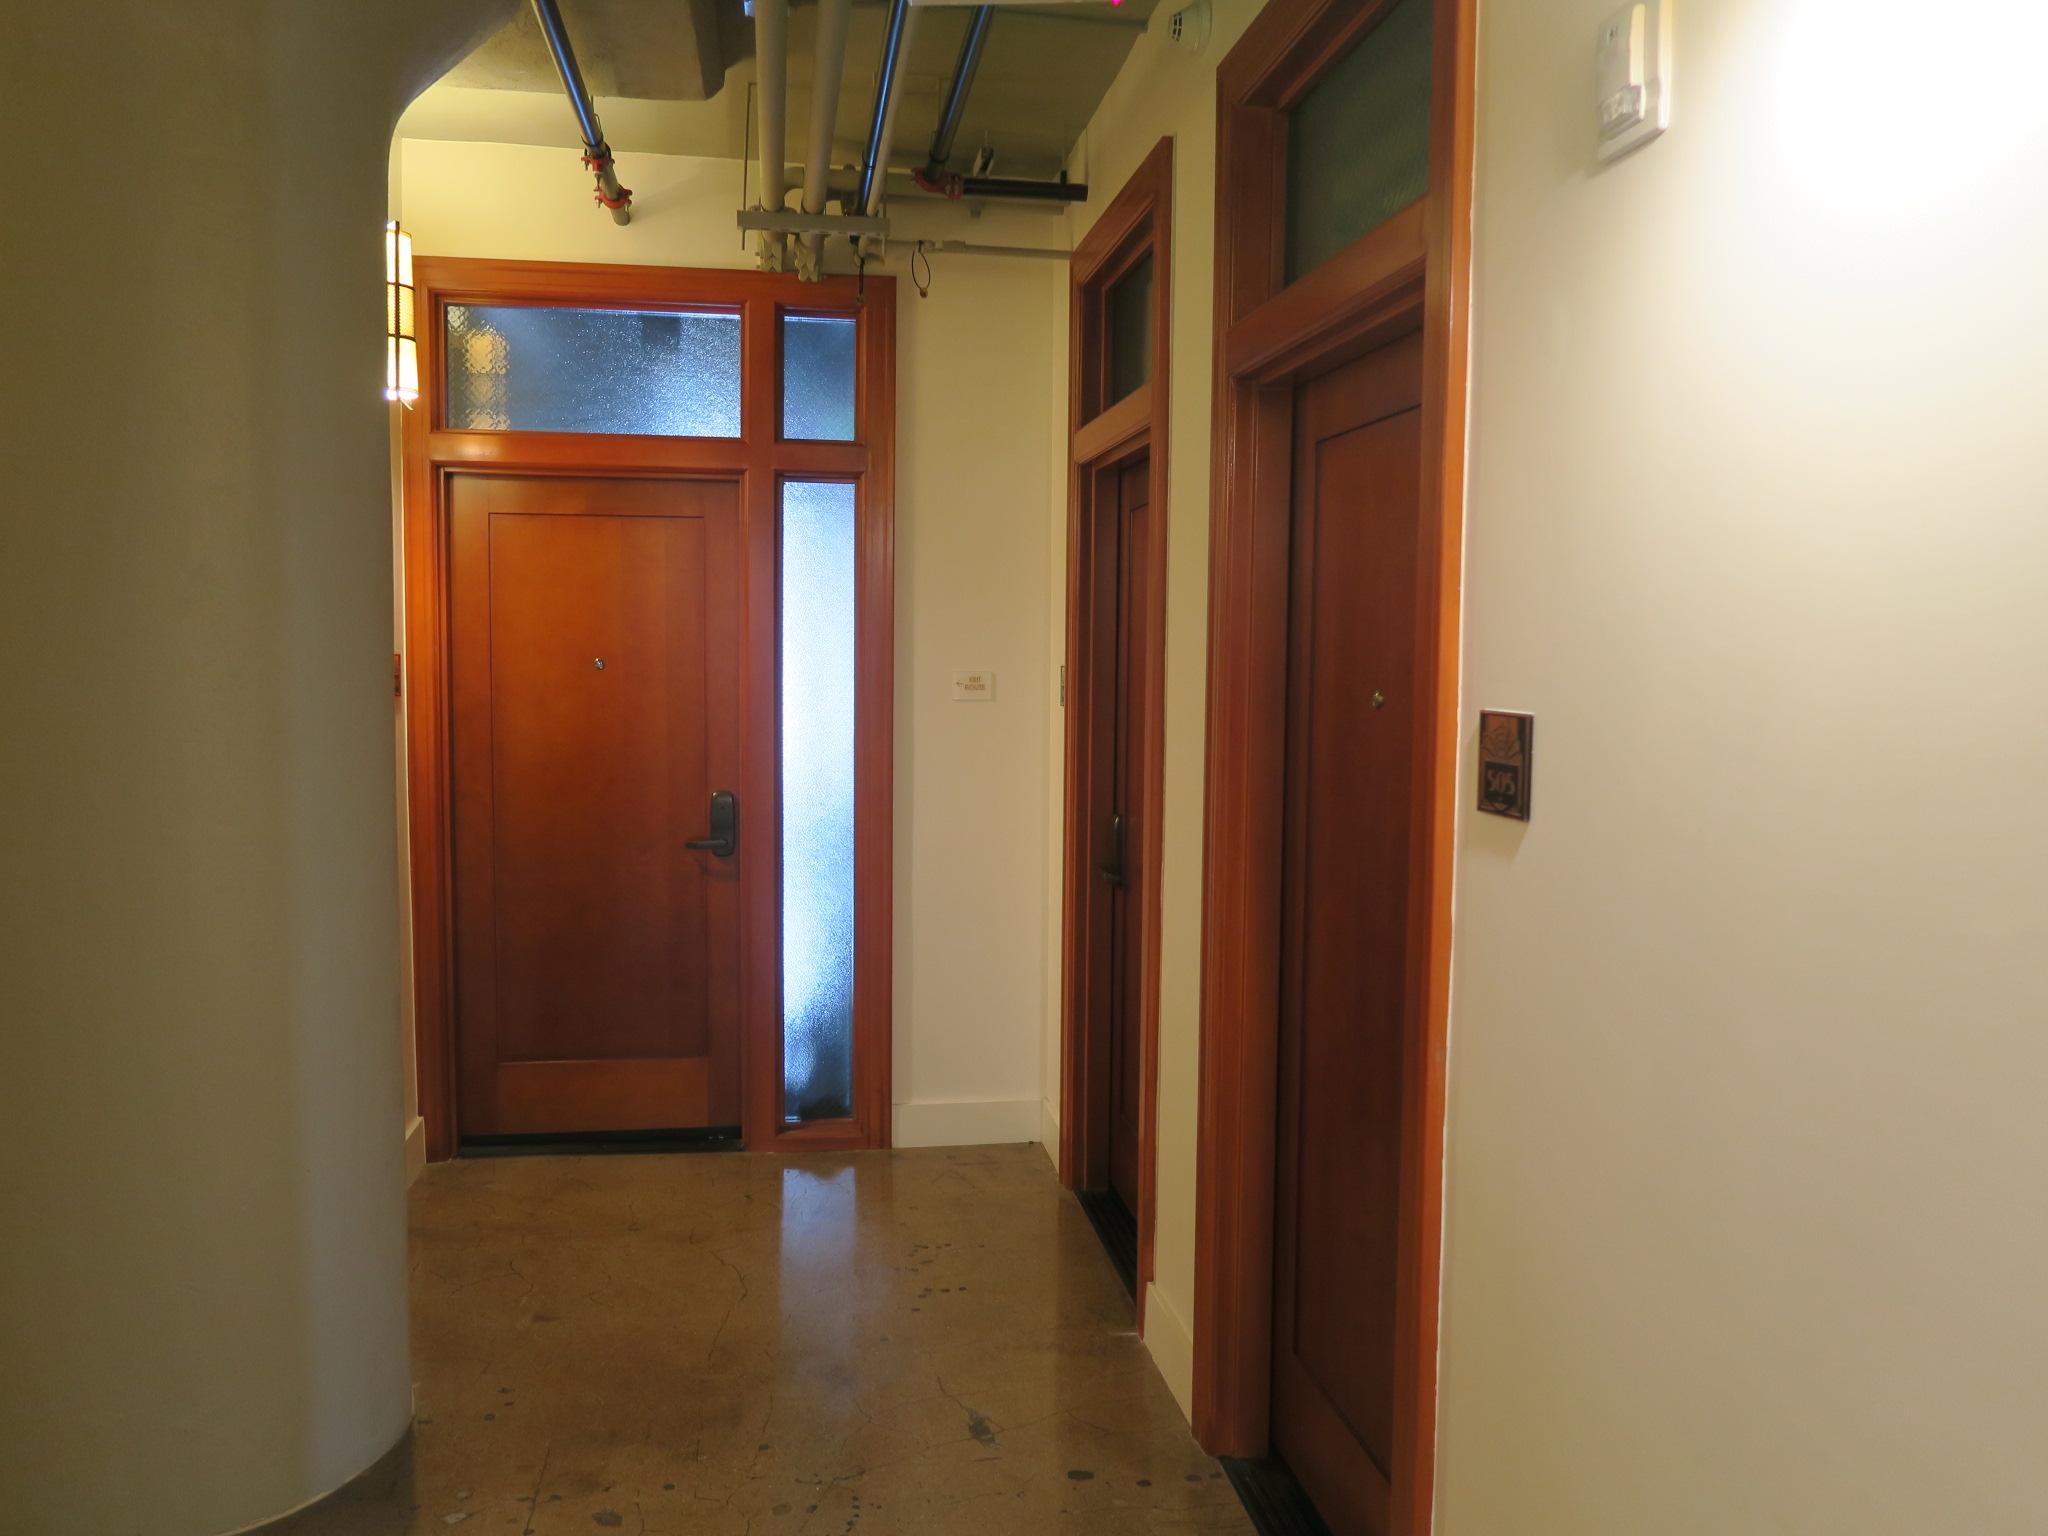 Interior wood doors from corridor, after rehabilitation.